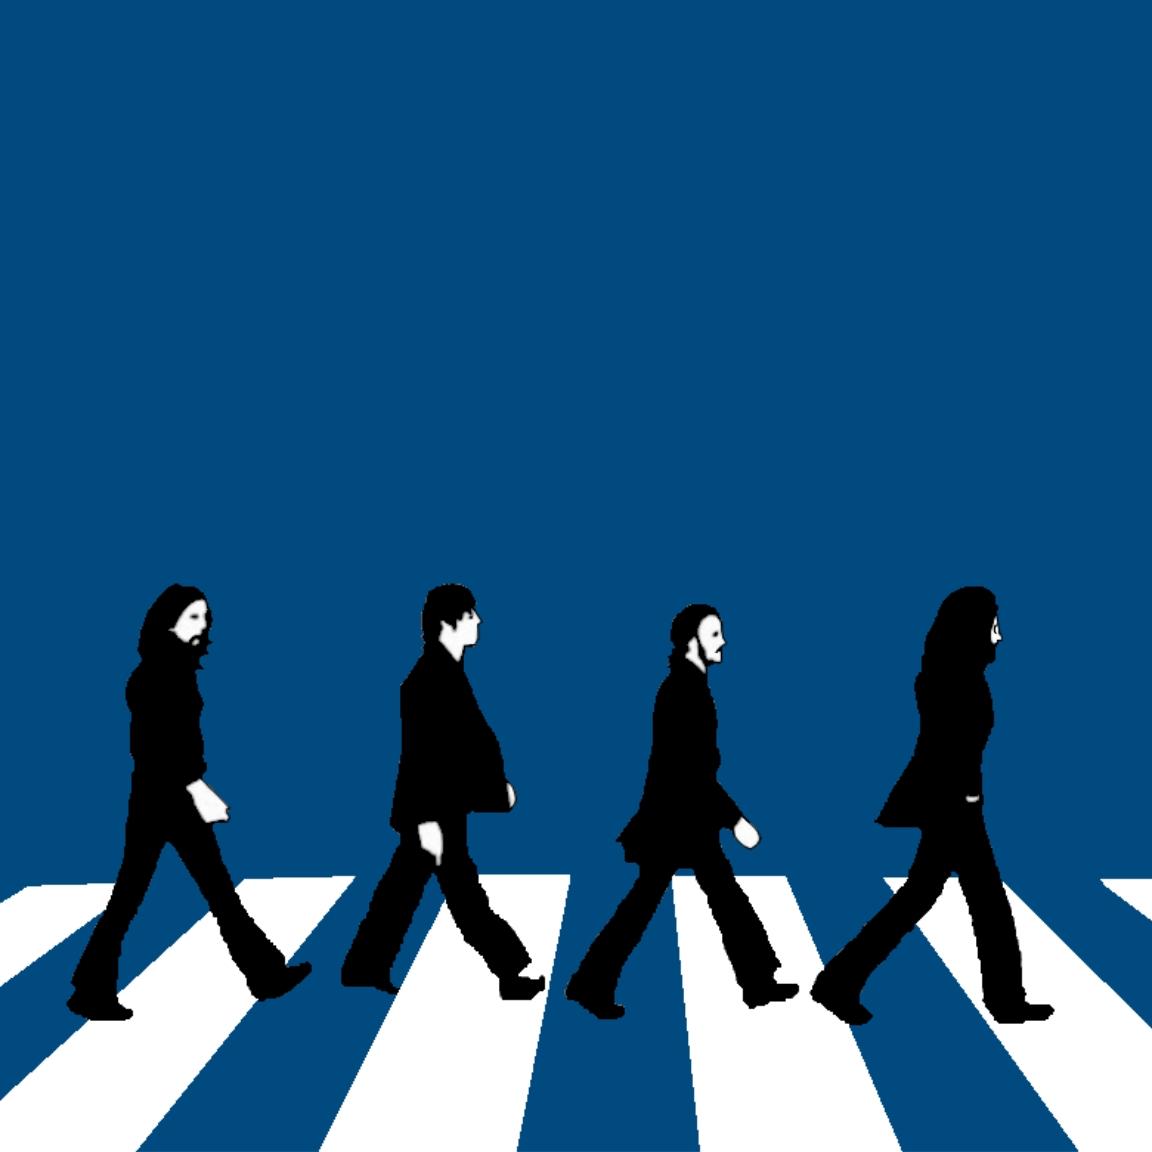 Beatles Clipart.